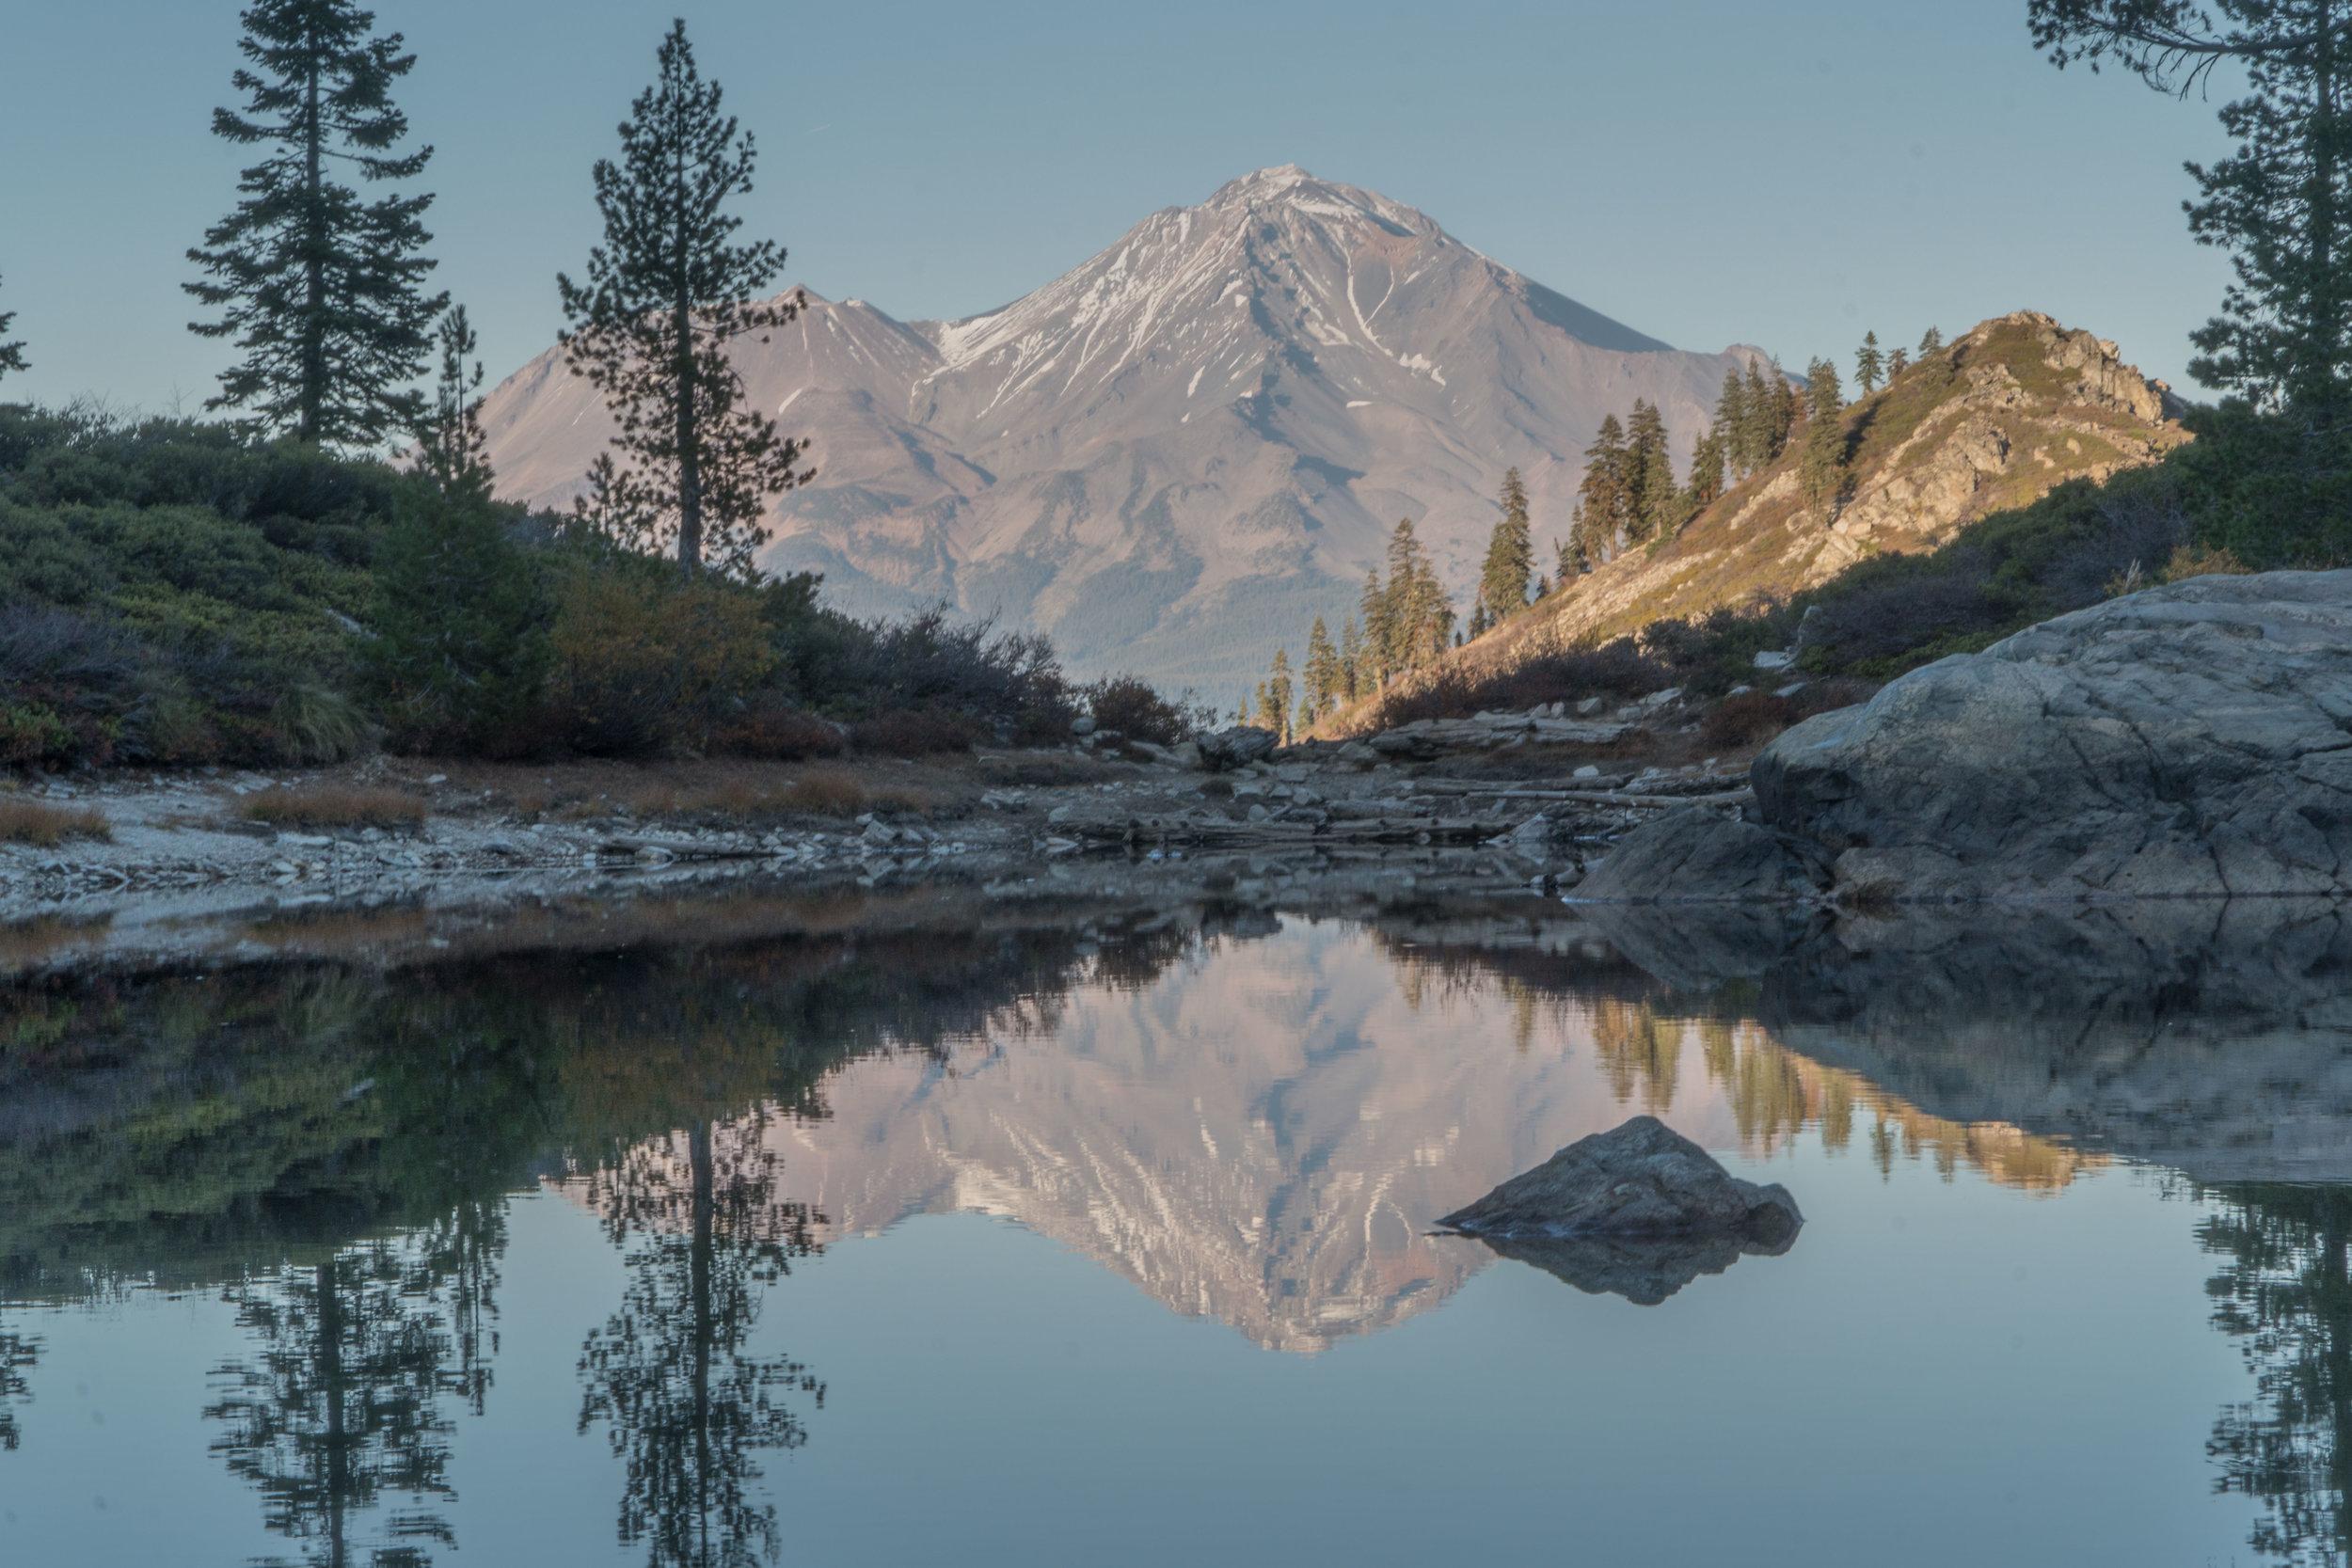 Mt Shasta Hiking Free Camping (1 of 7).jpg